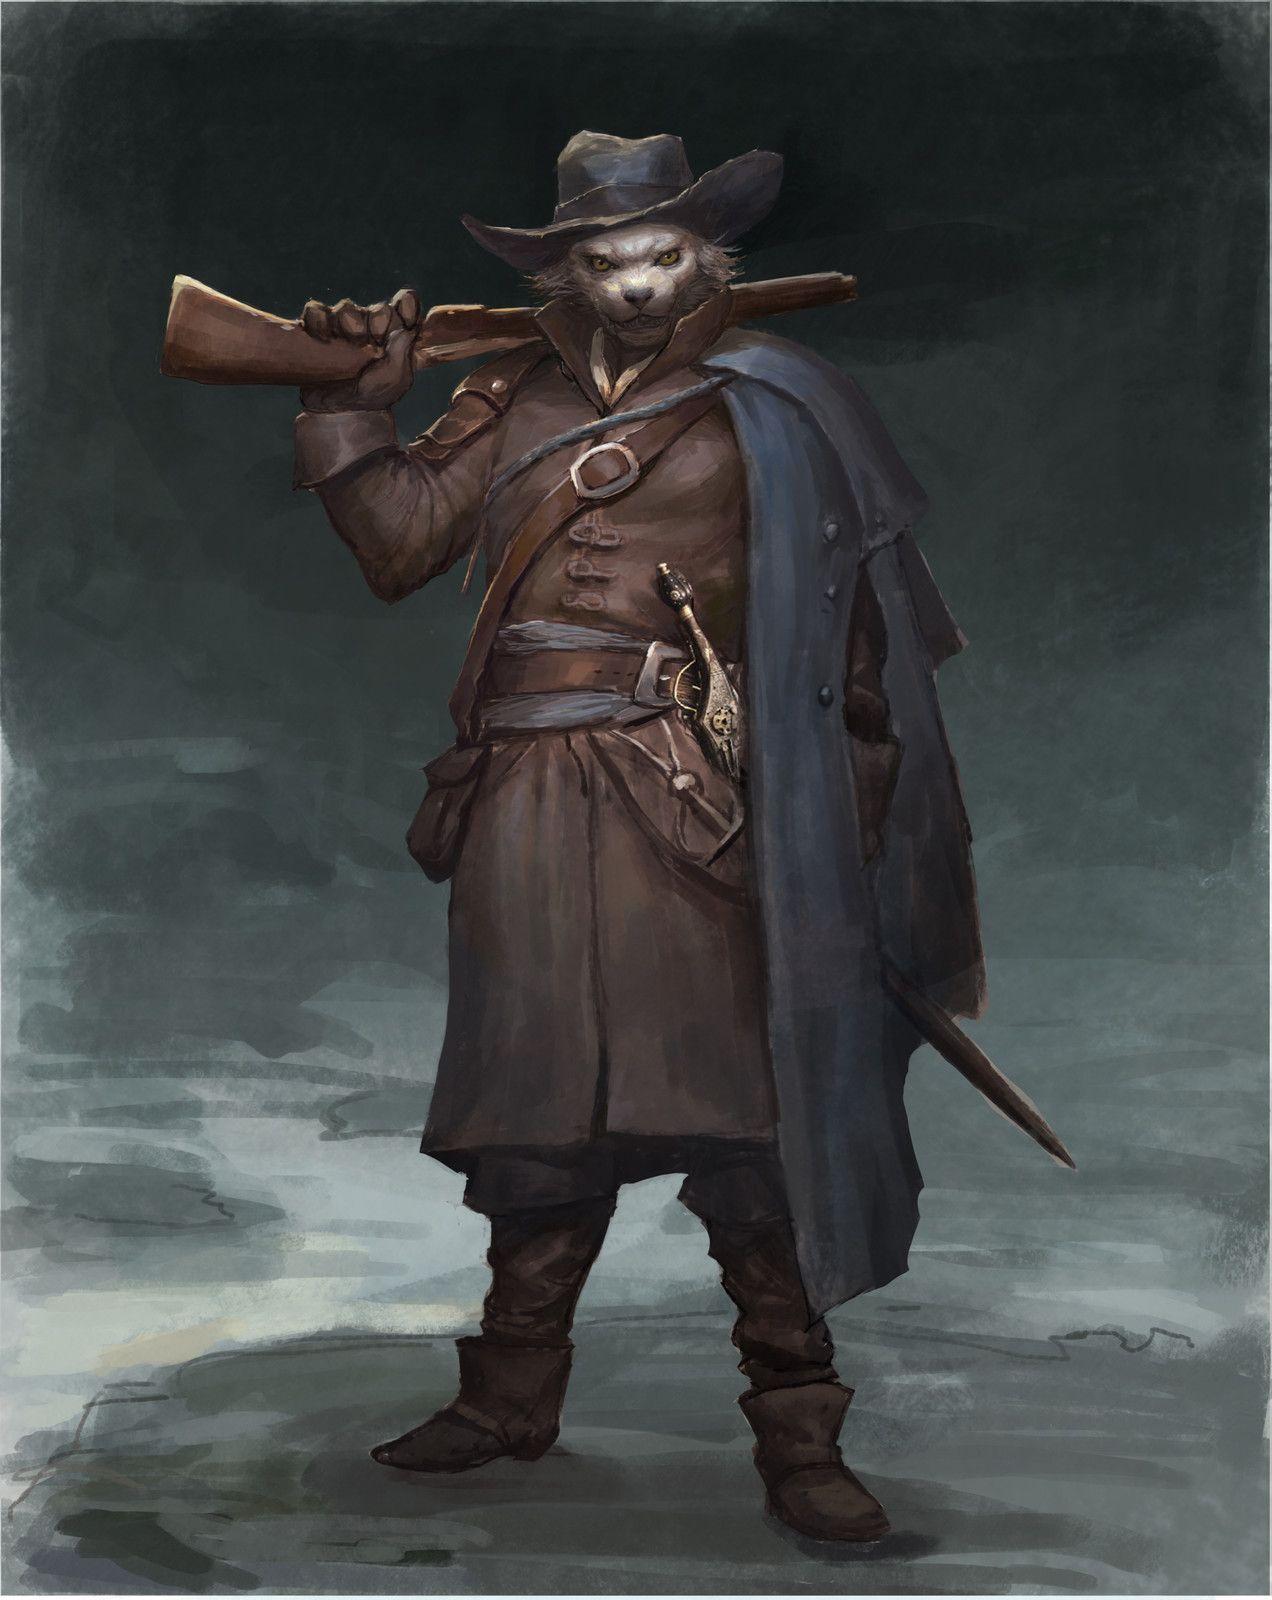 musketeers, li joshua on ArtStation at https://www.artstation.com/artwork/musketeers-222c96ad-2fd7-468d-a5ed-34da527a6b57